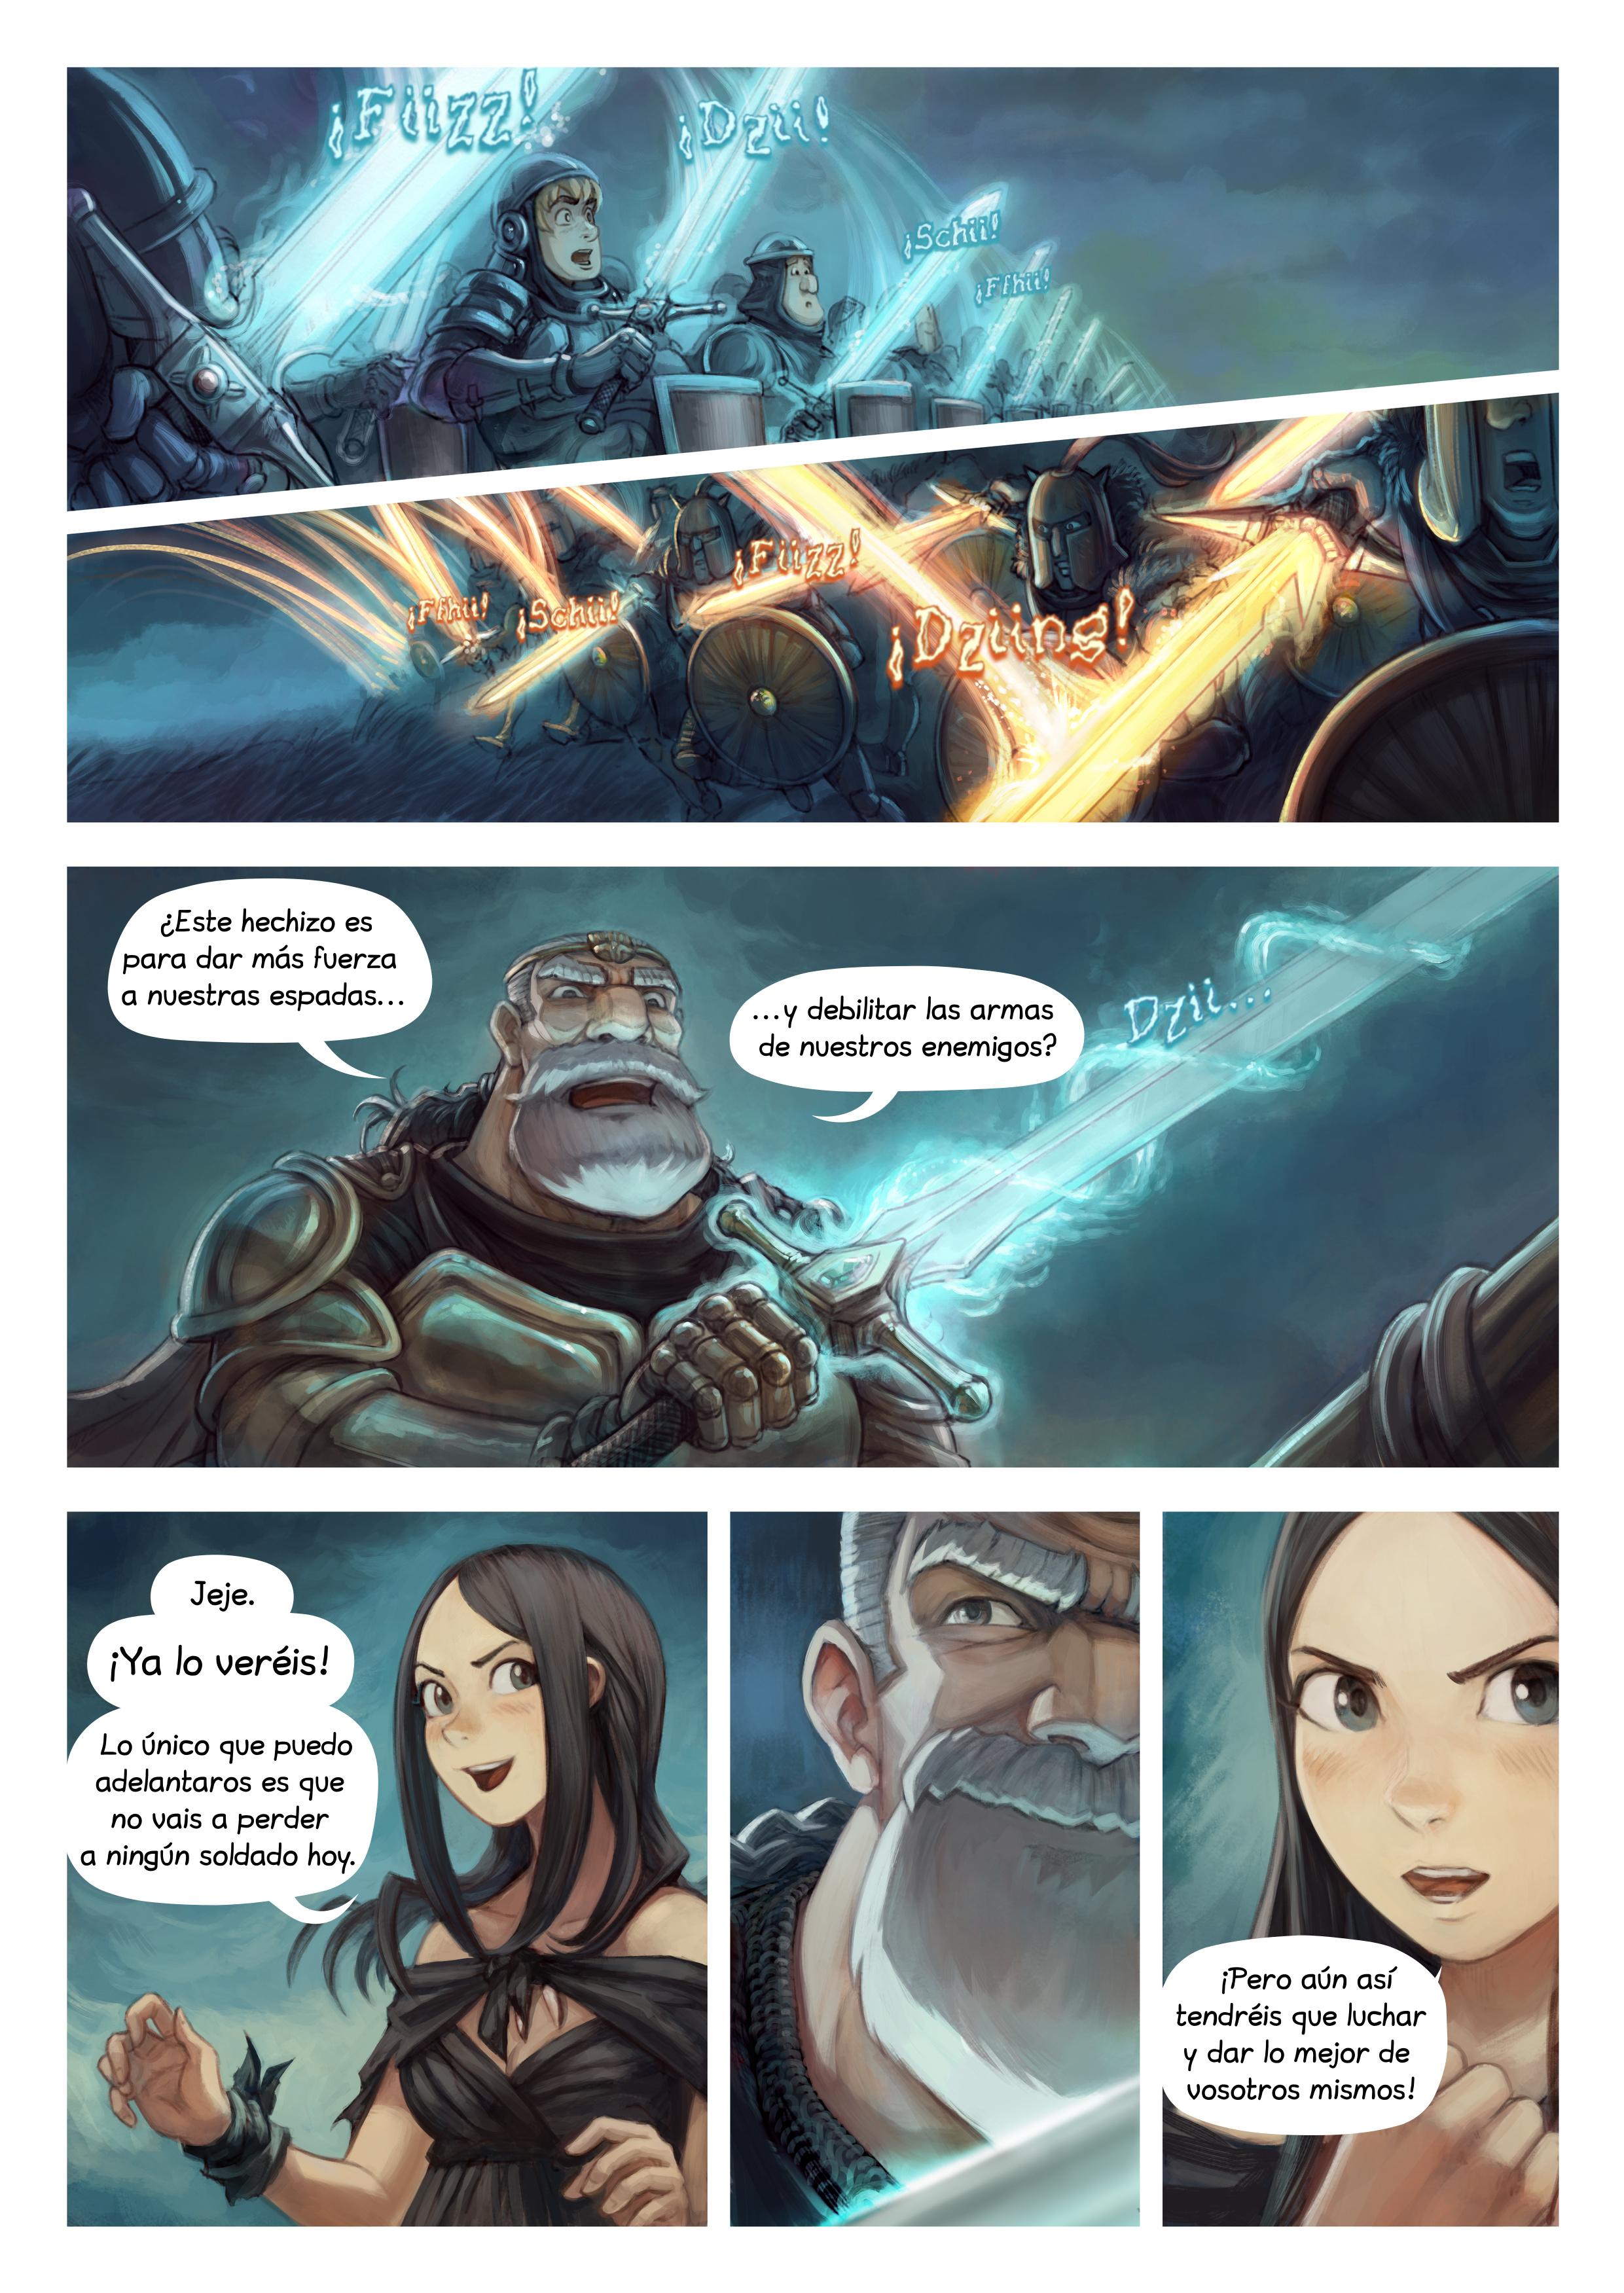 Episodio 33: Hechizo de guerra, Page 3